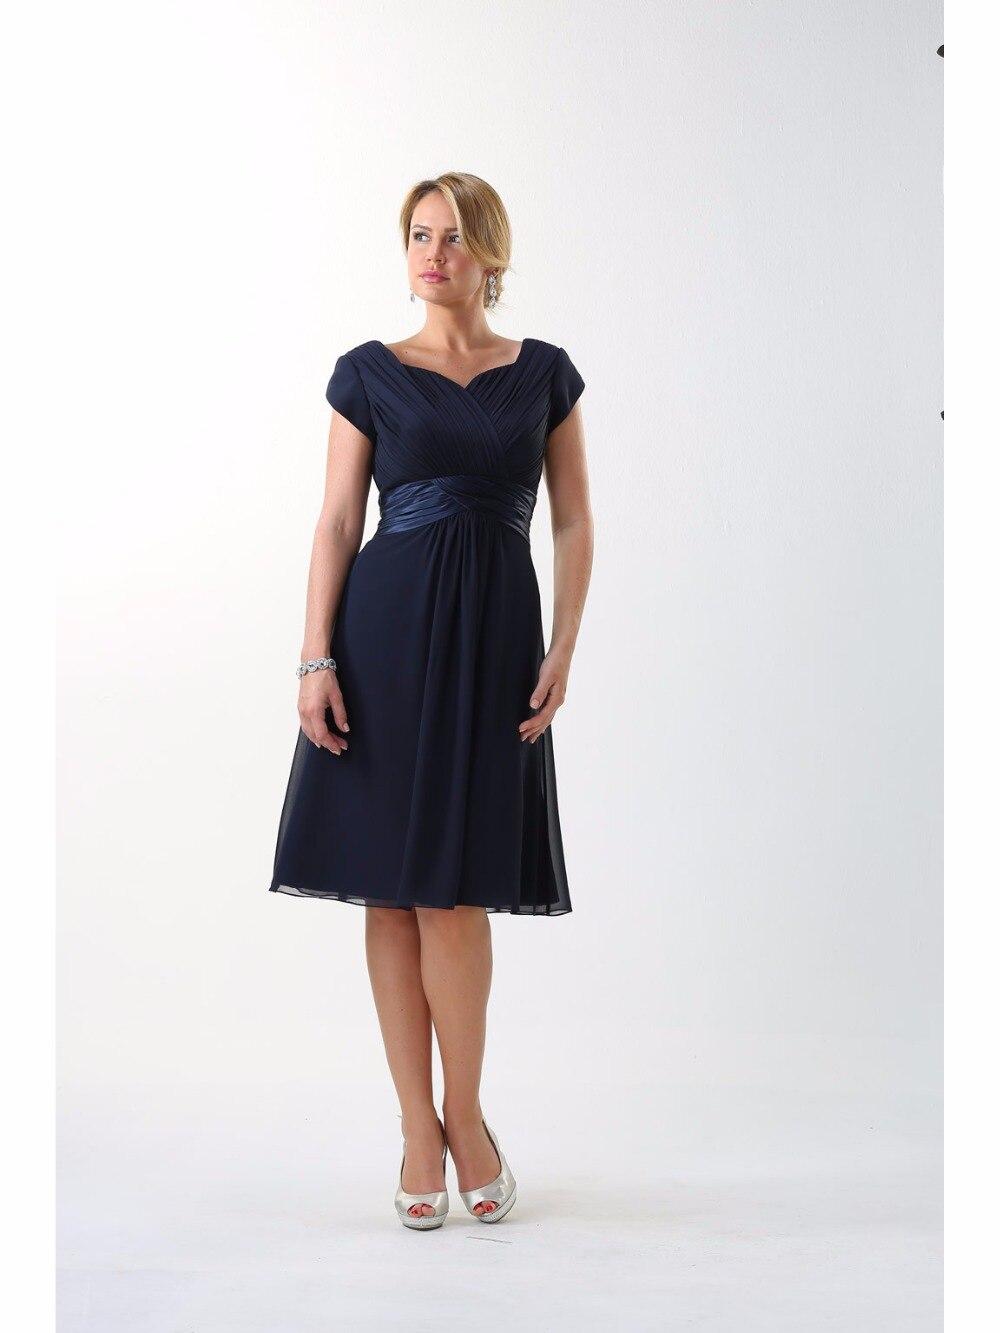 Online get cheap modest bridesmaid dresses with sleeves navy navy blue short modest bridesmaid dresses with cap sleeves sweetheart navy blue informal beach summer maids ombrellifo Gallery